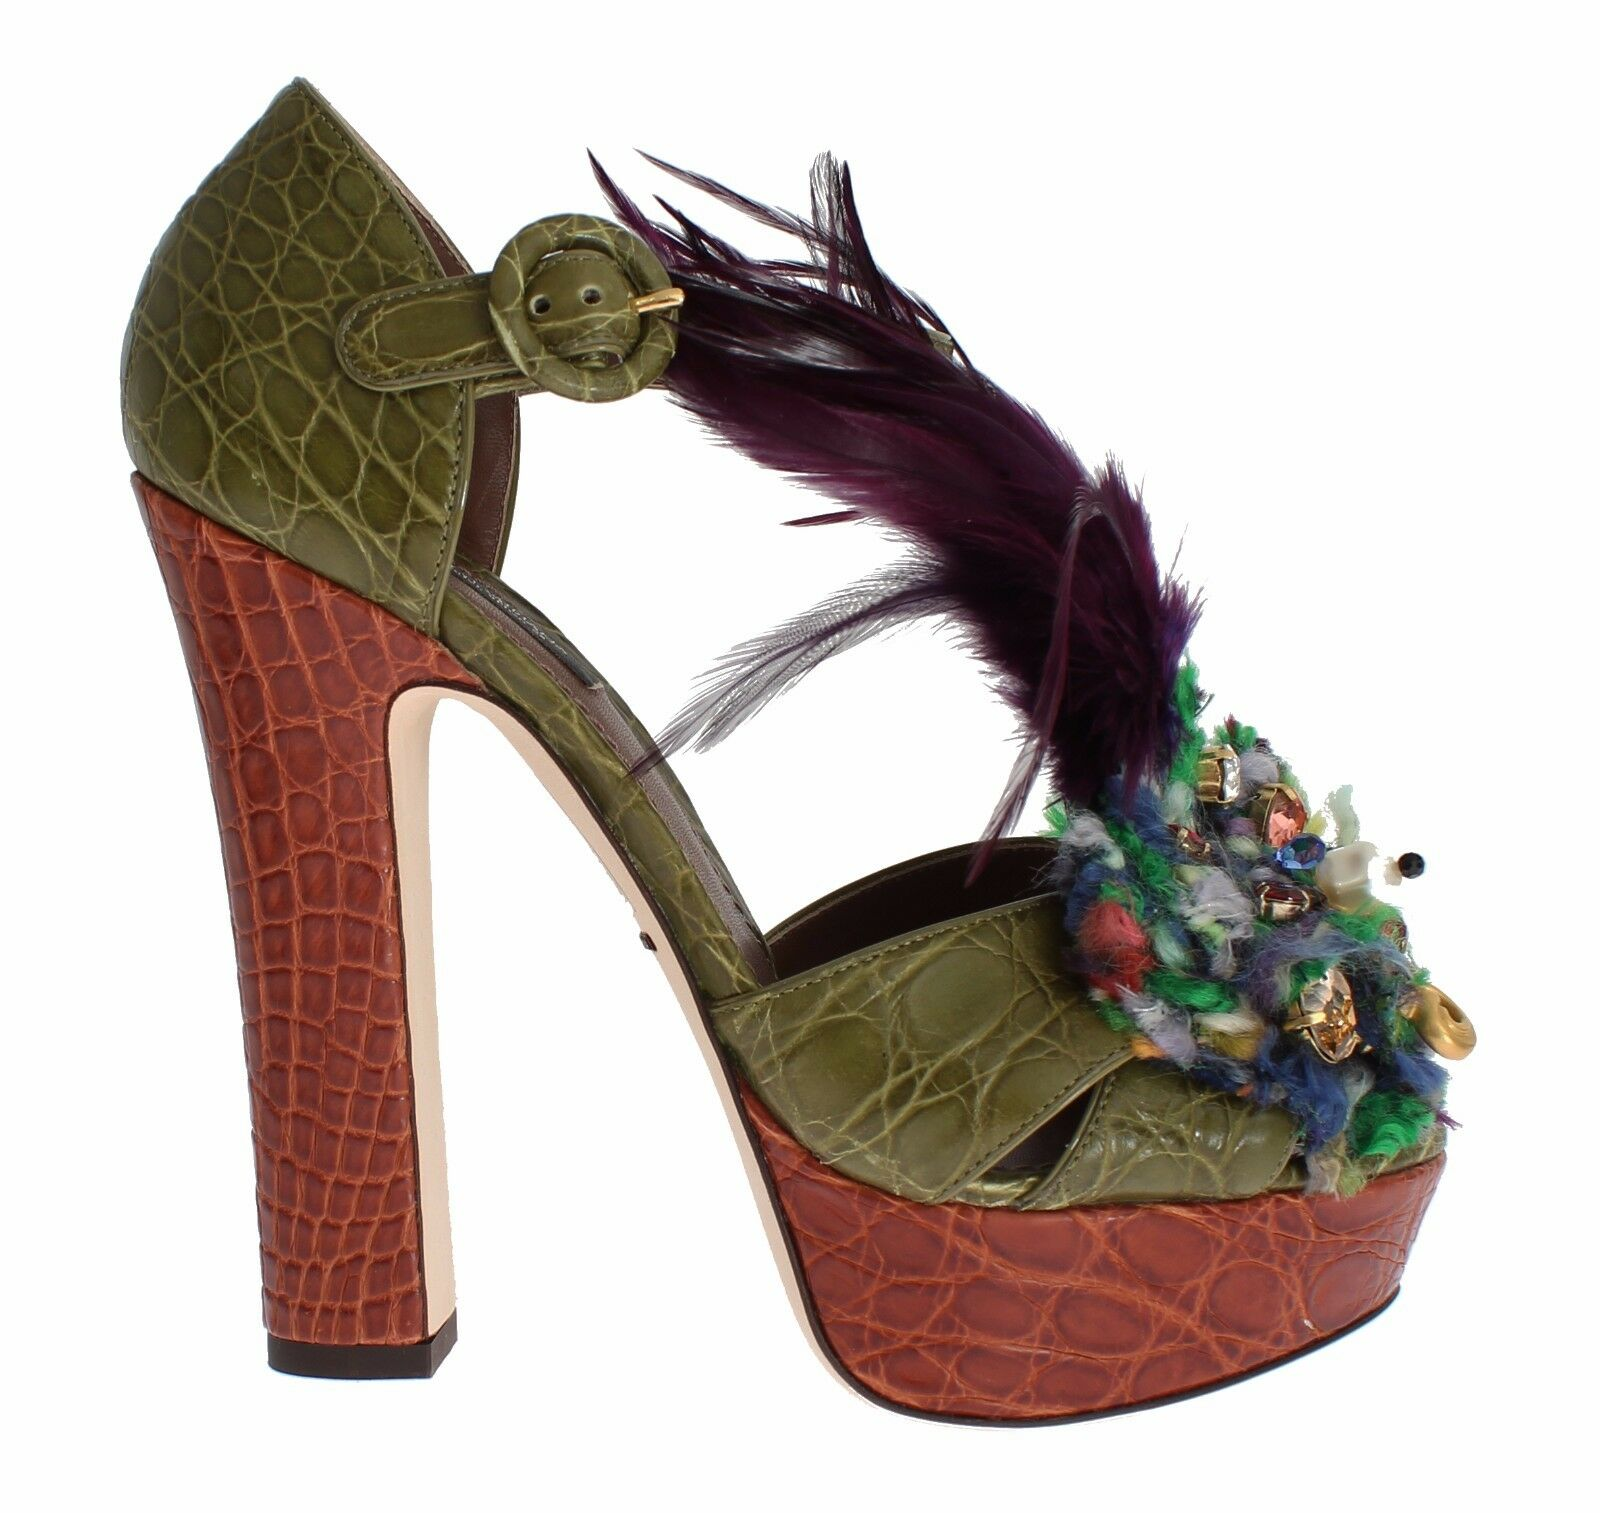 NWT $3800 DOLCE & Caiman GABBANA Caiman & Crocodile Leather Crystal Shoes EU35 / US4.5 d4305a